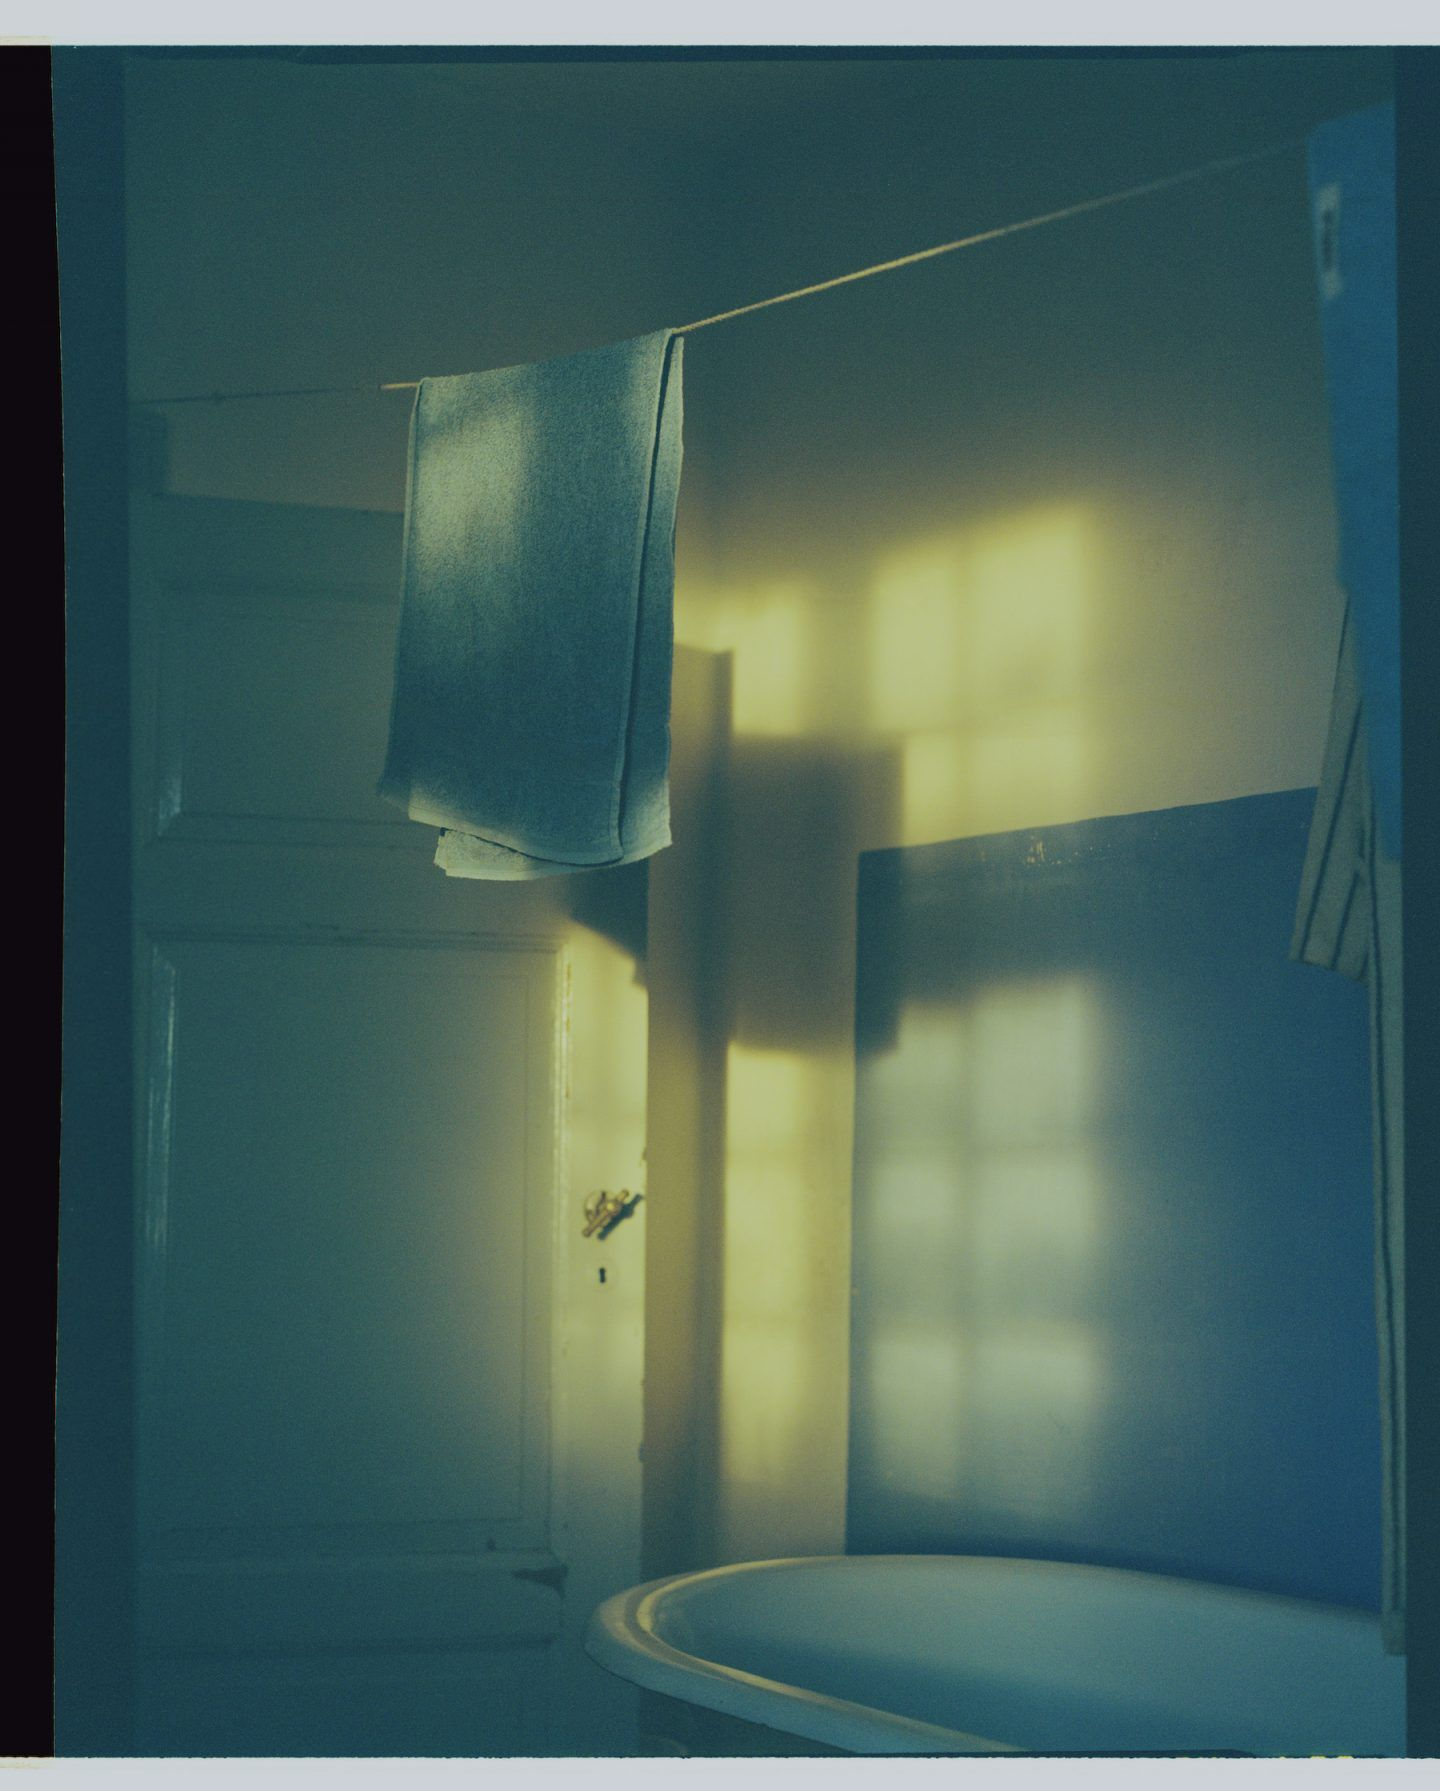 IGNANT-Photography-Tekla-Philip-Messmann-03